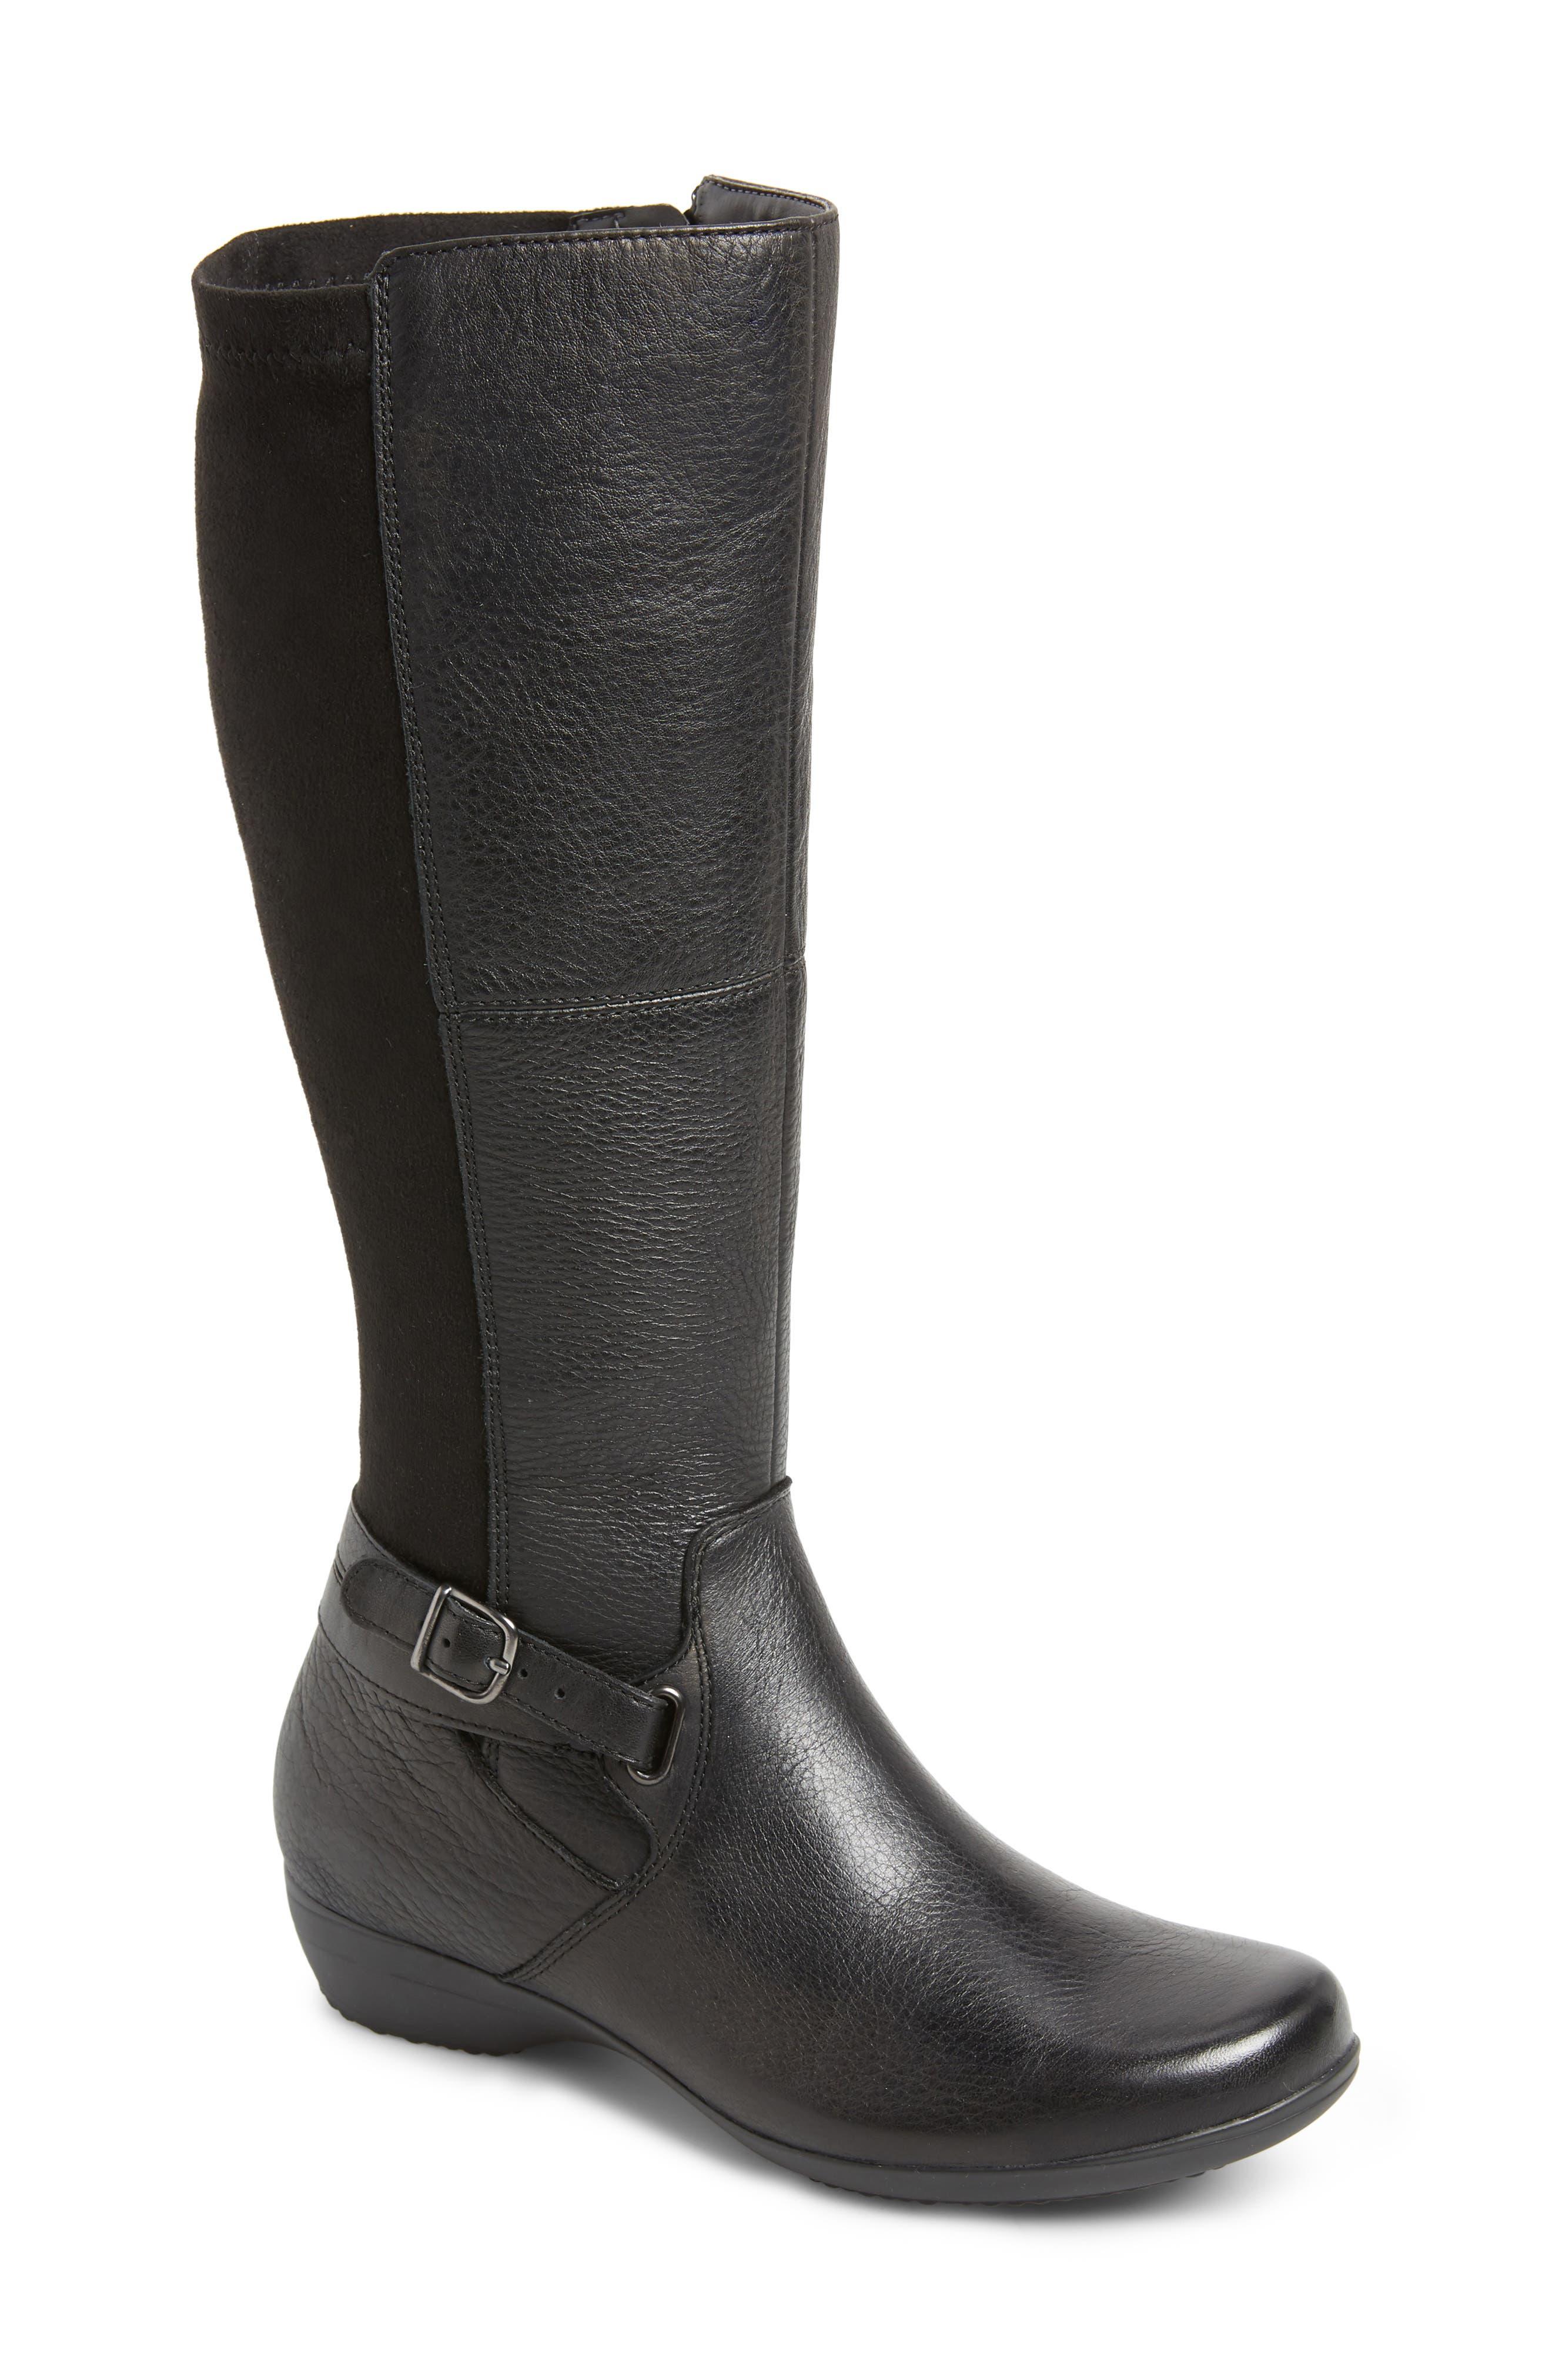 Dansko Francesca Knee High Riding Boot - Black